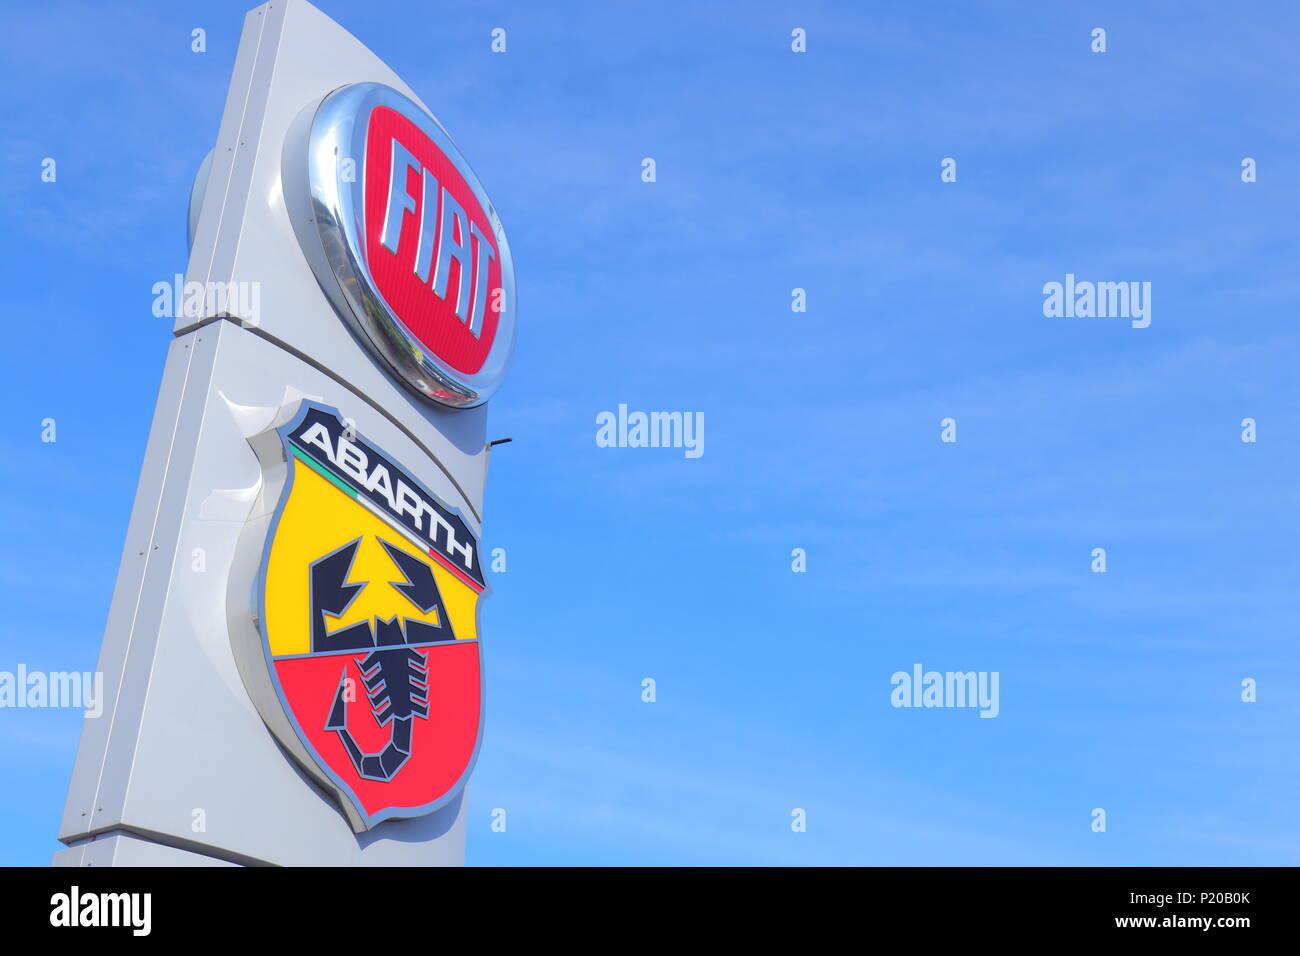 Fiat Sign Stock Photos Fiat Sign Stock Images Alamy